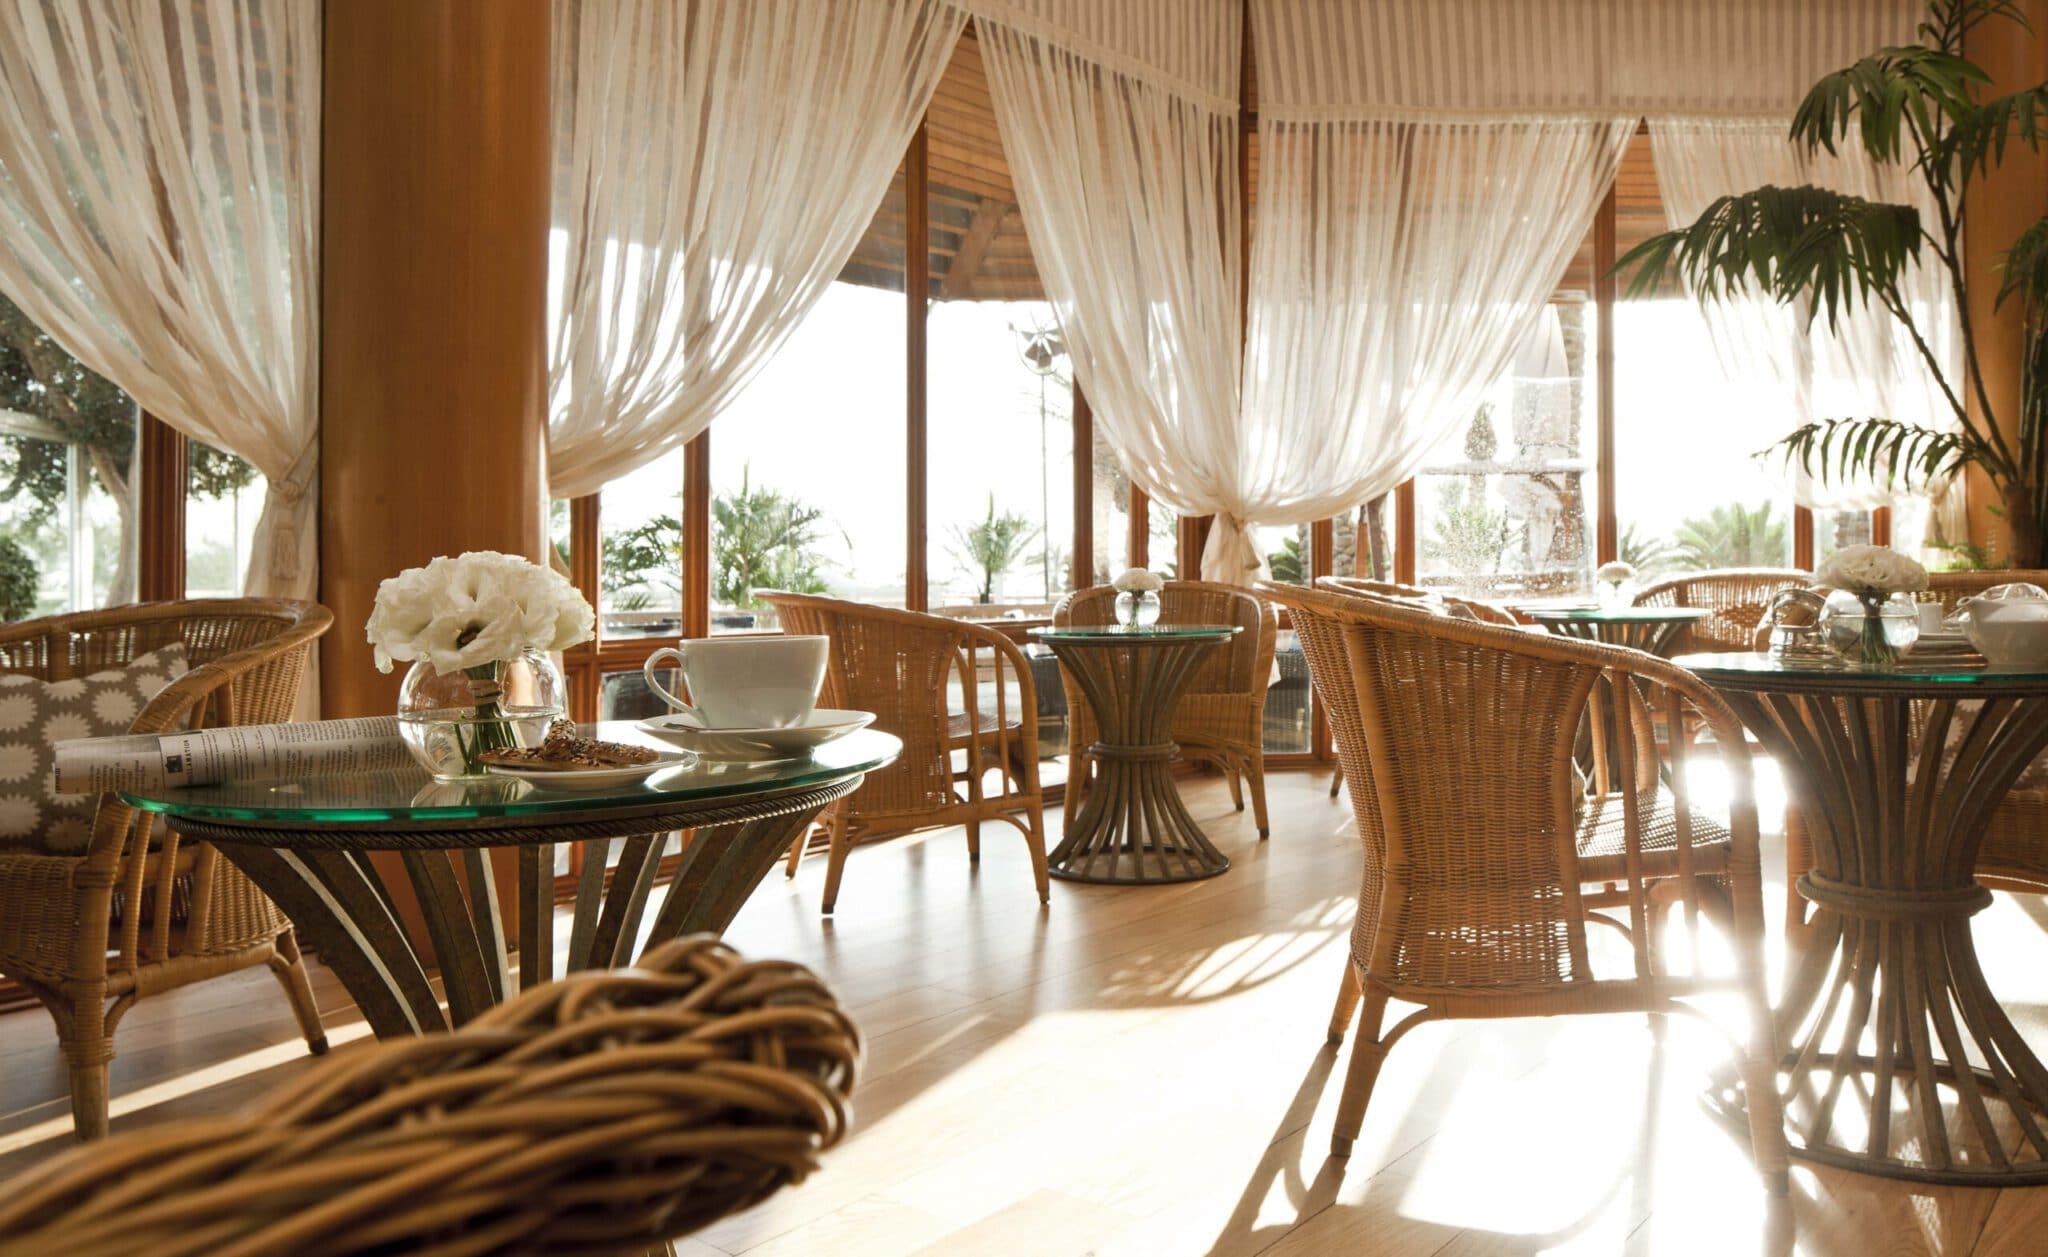 ROYAL BEACH HOTEL ISROTEL EILAT RENOVATION